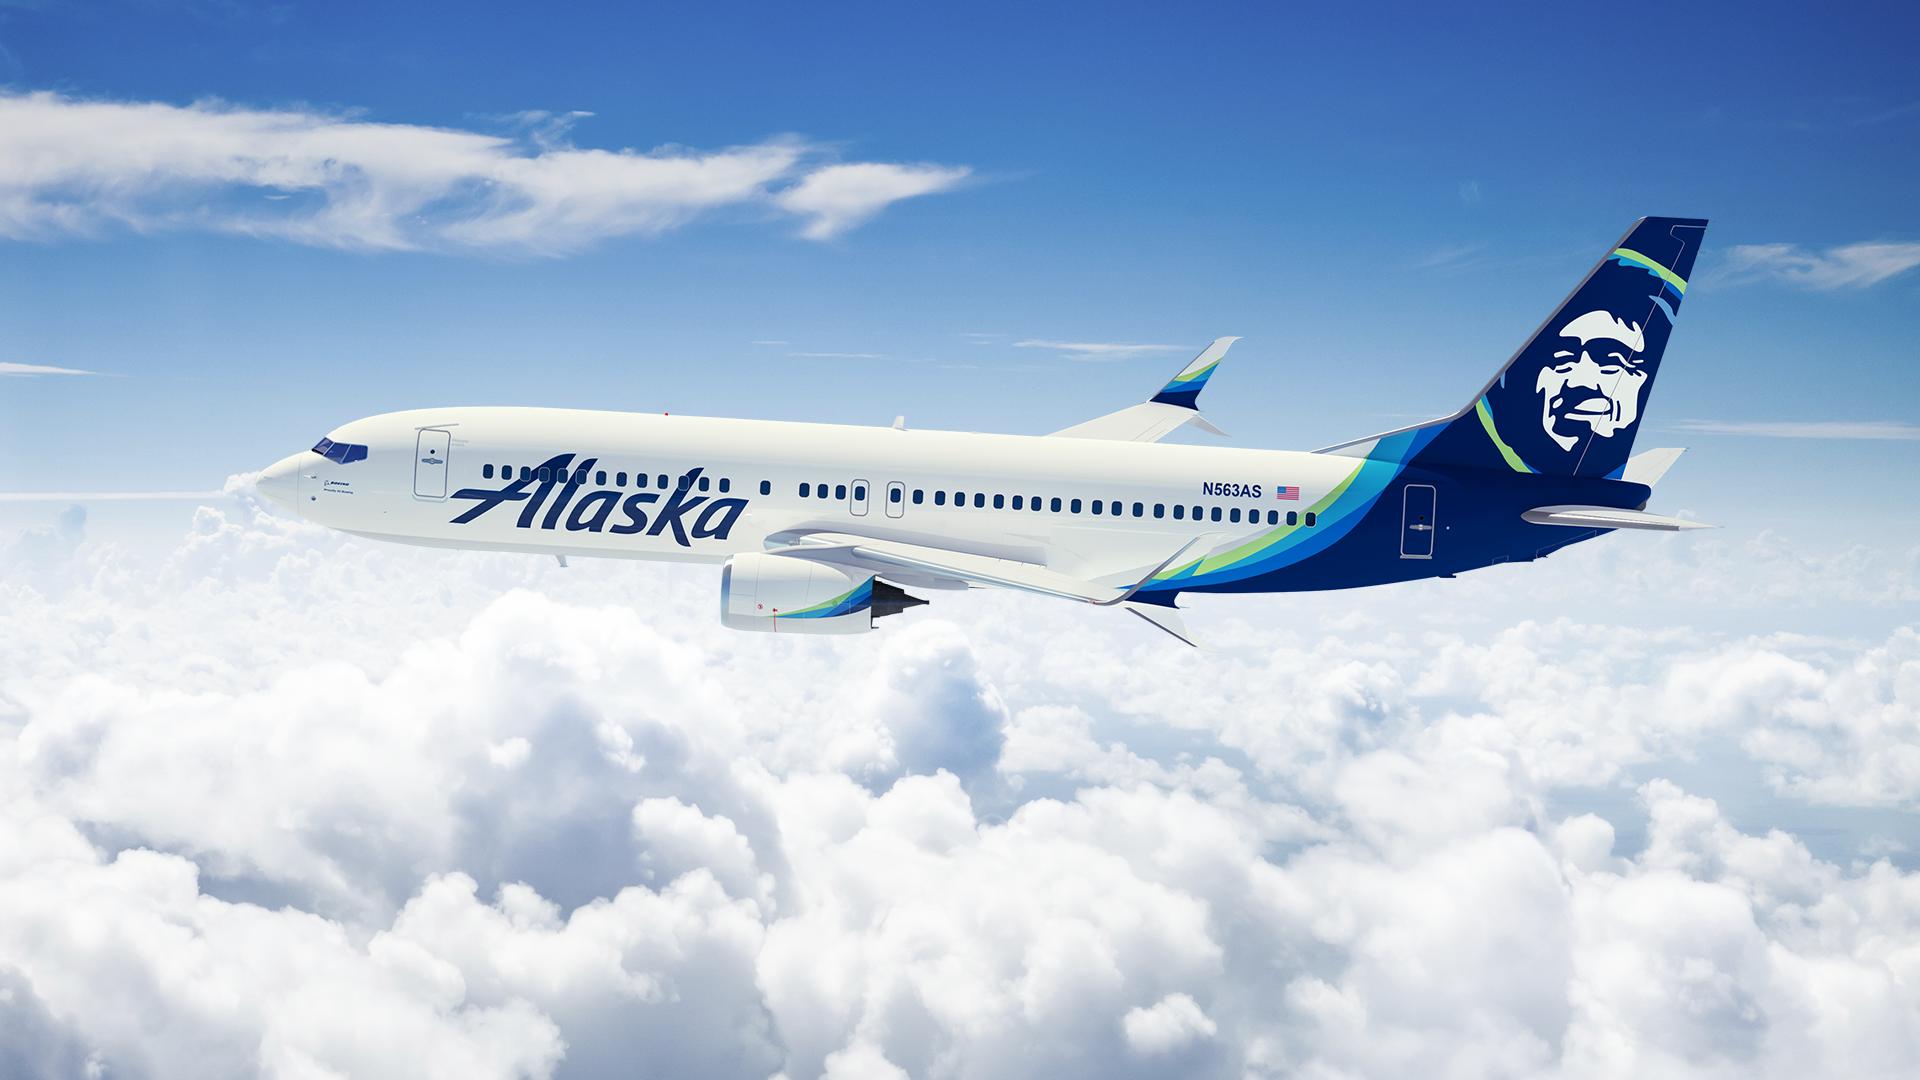 Photo Credit: Alaska Airlines